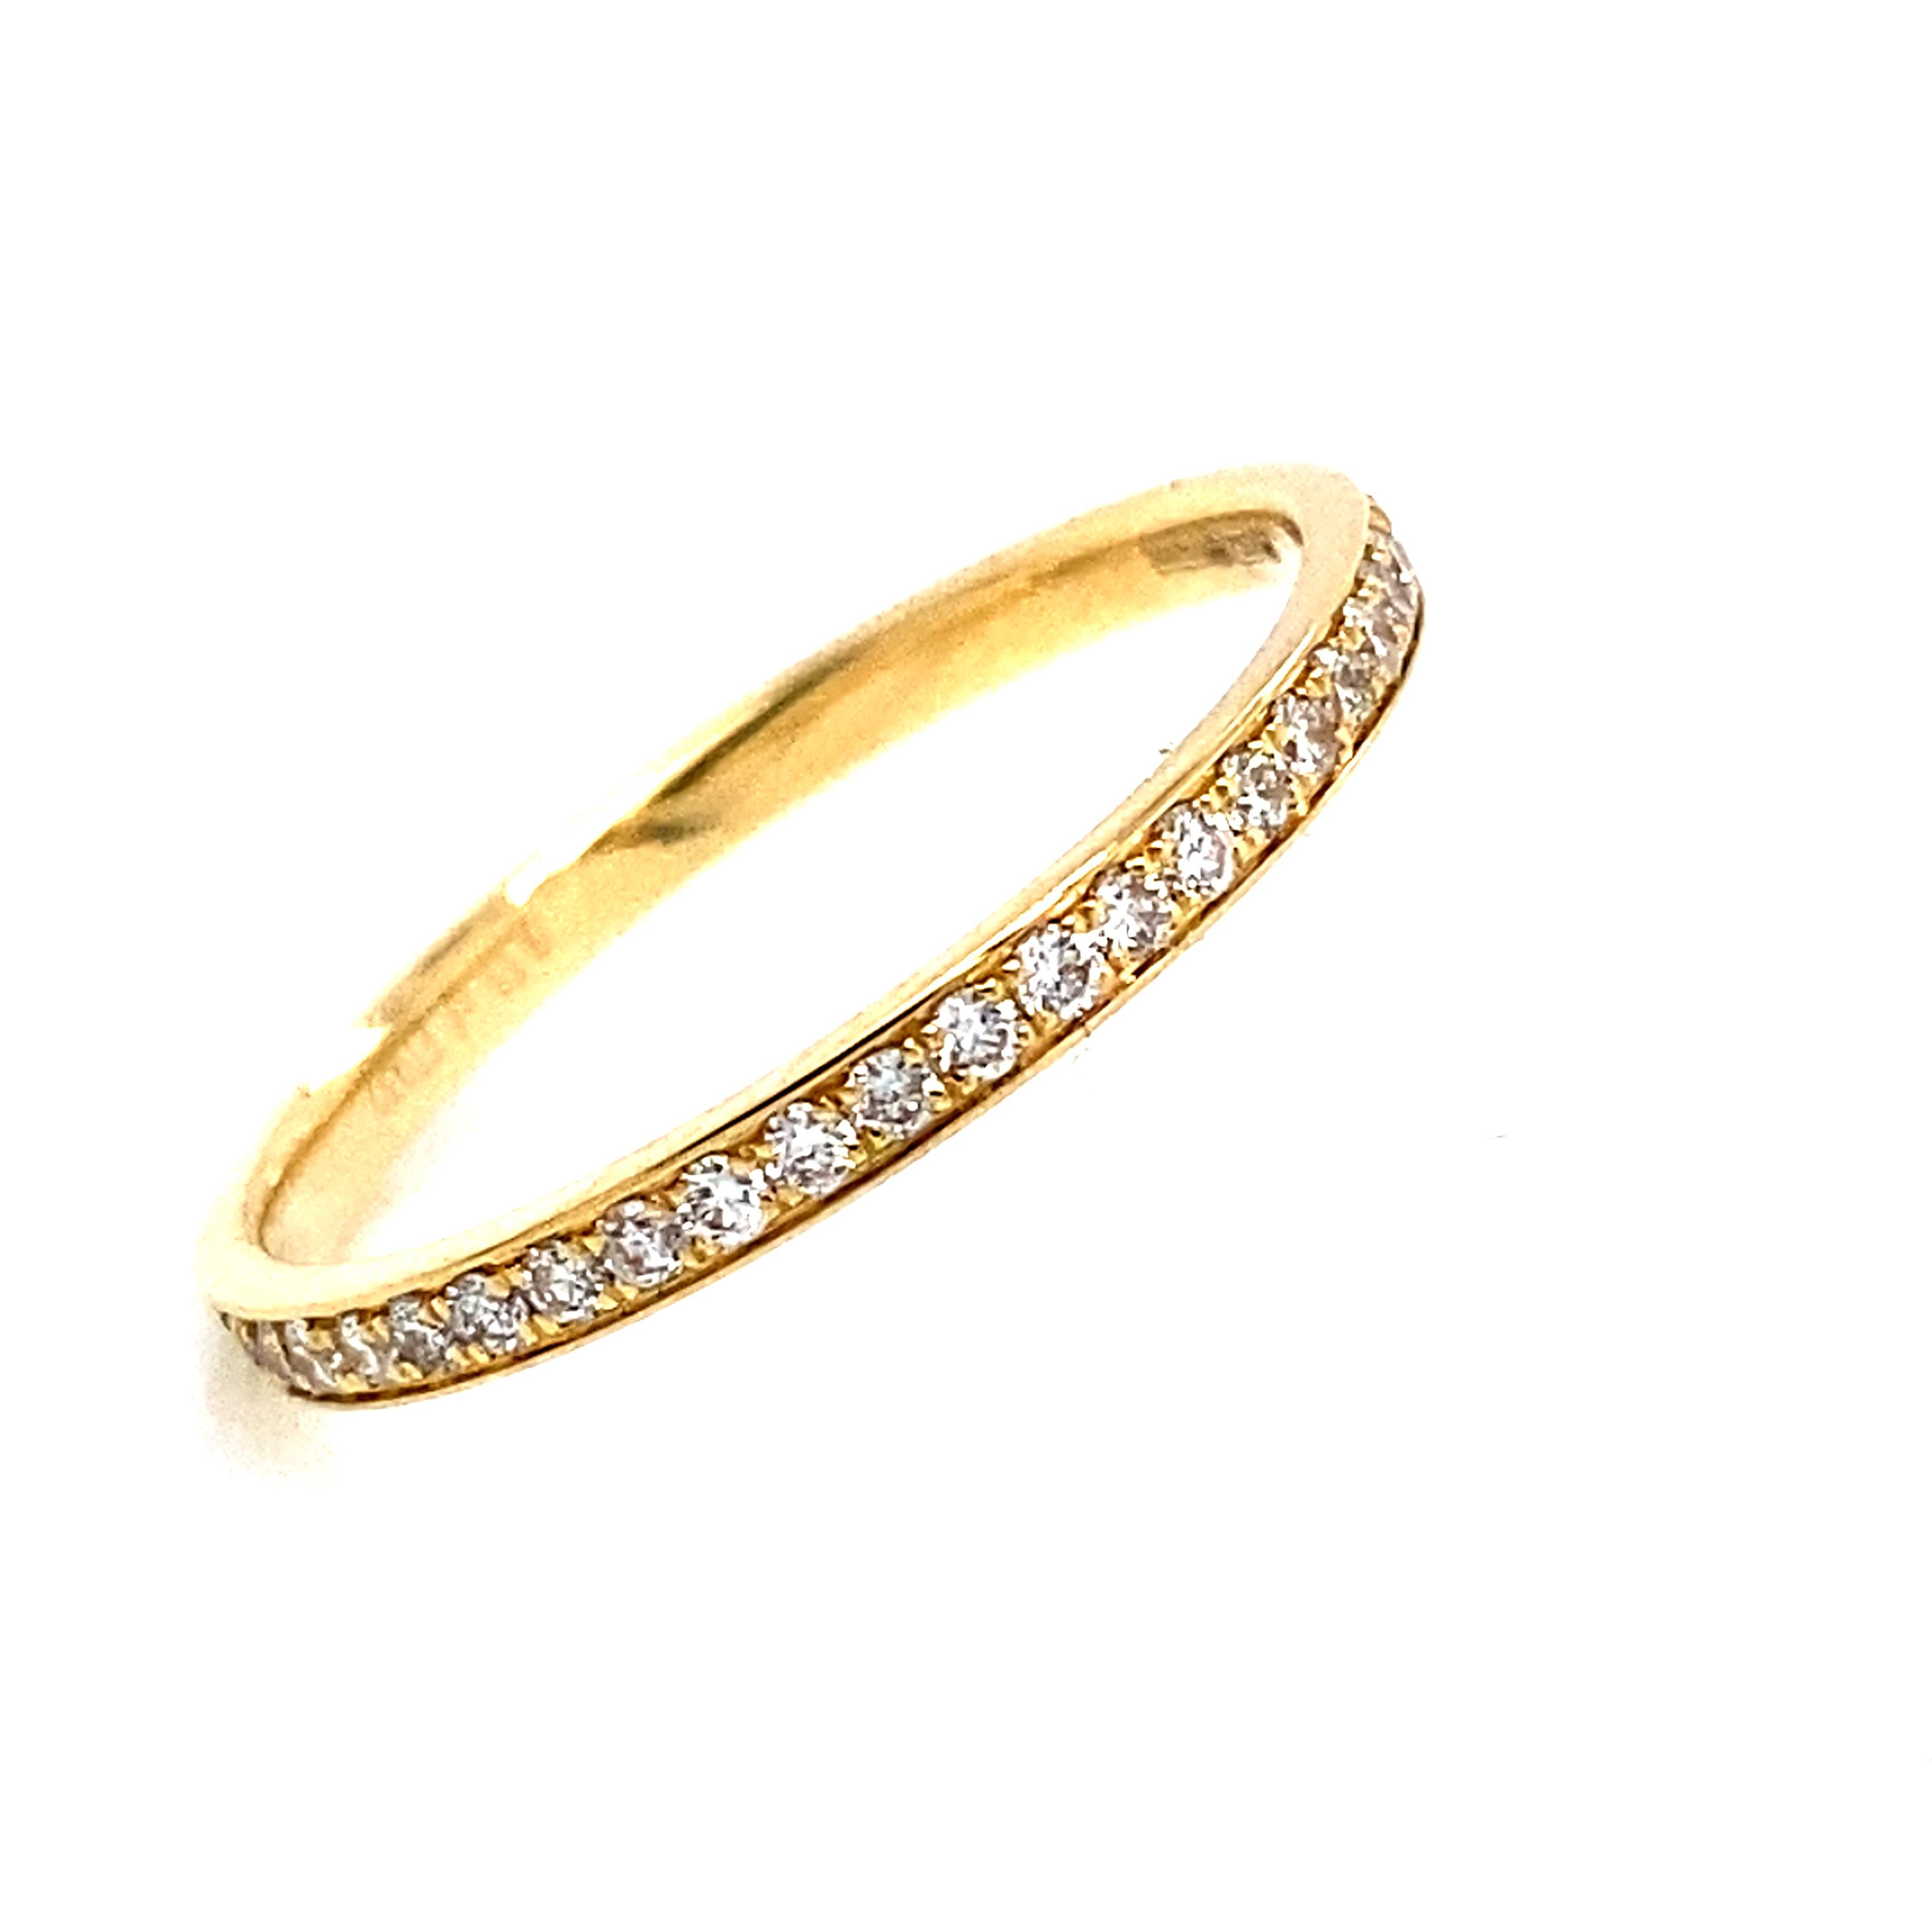 Full Grain Set Eternity Style Ring in 18 Carat Yellow Gold